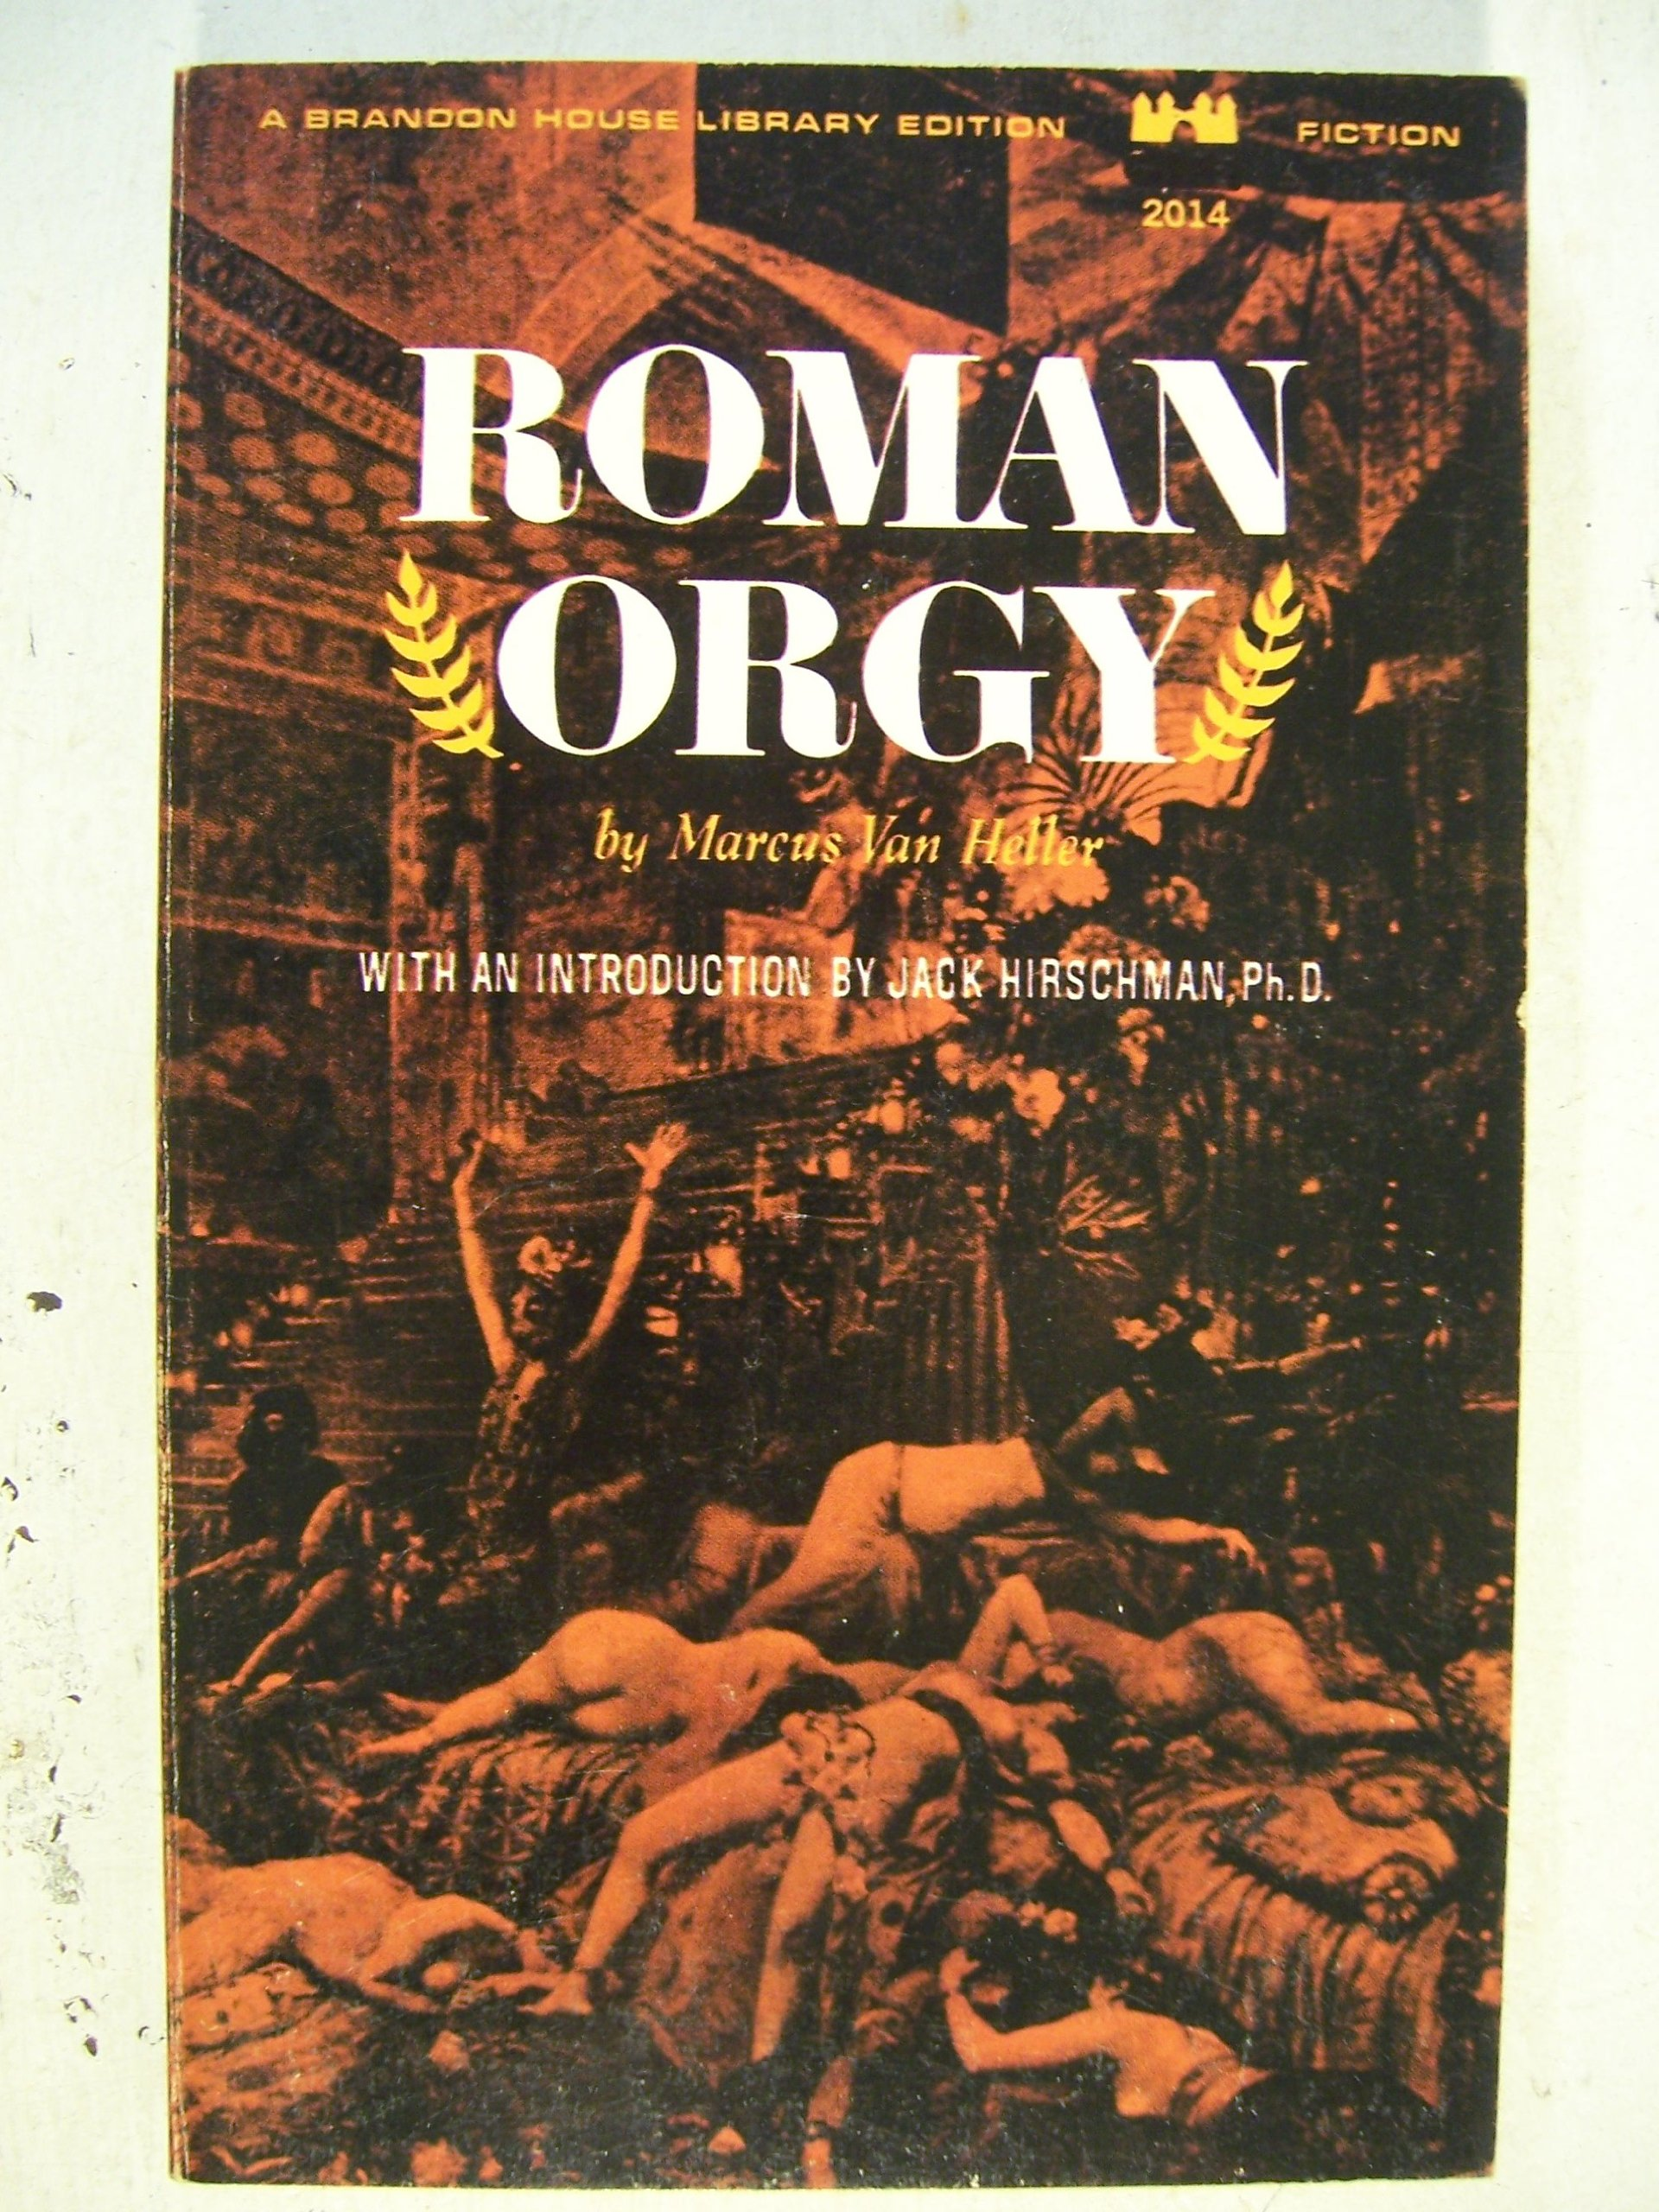 Roman orgy fiction not